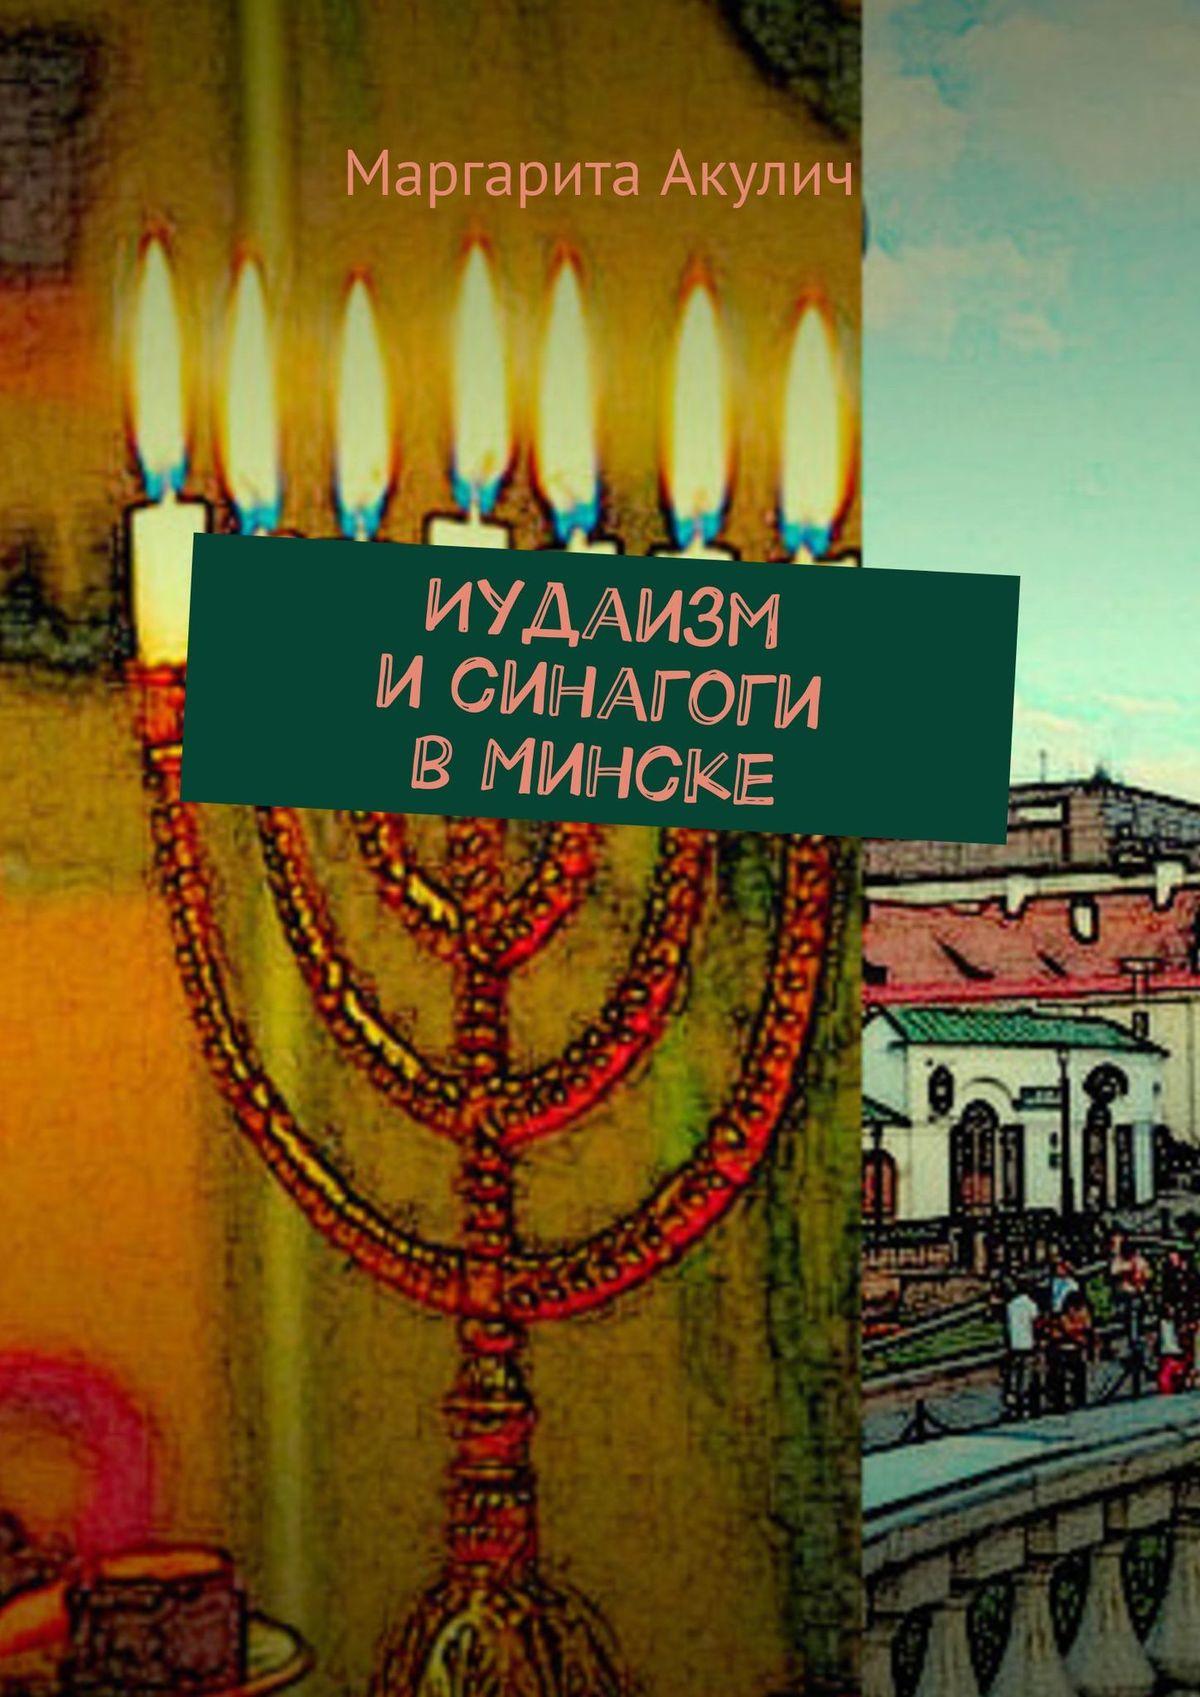 Маргарита Акулич Иудаизм и синагоги в Минске био блис купить в минске